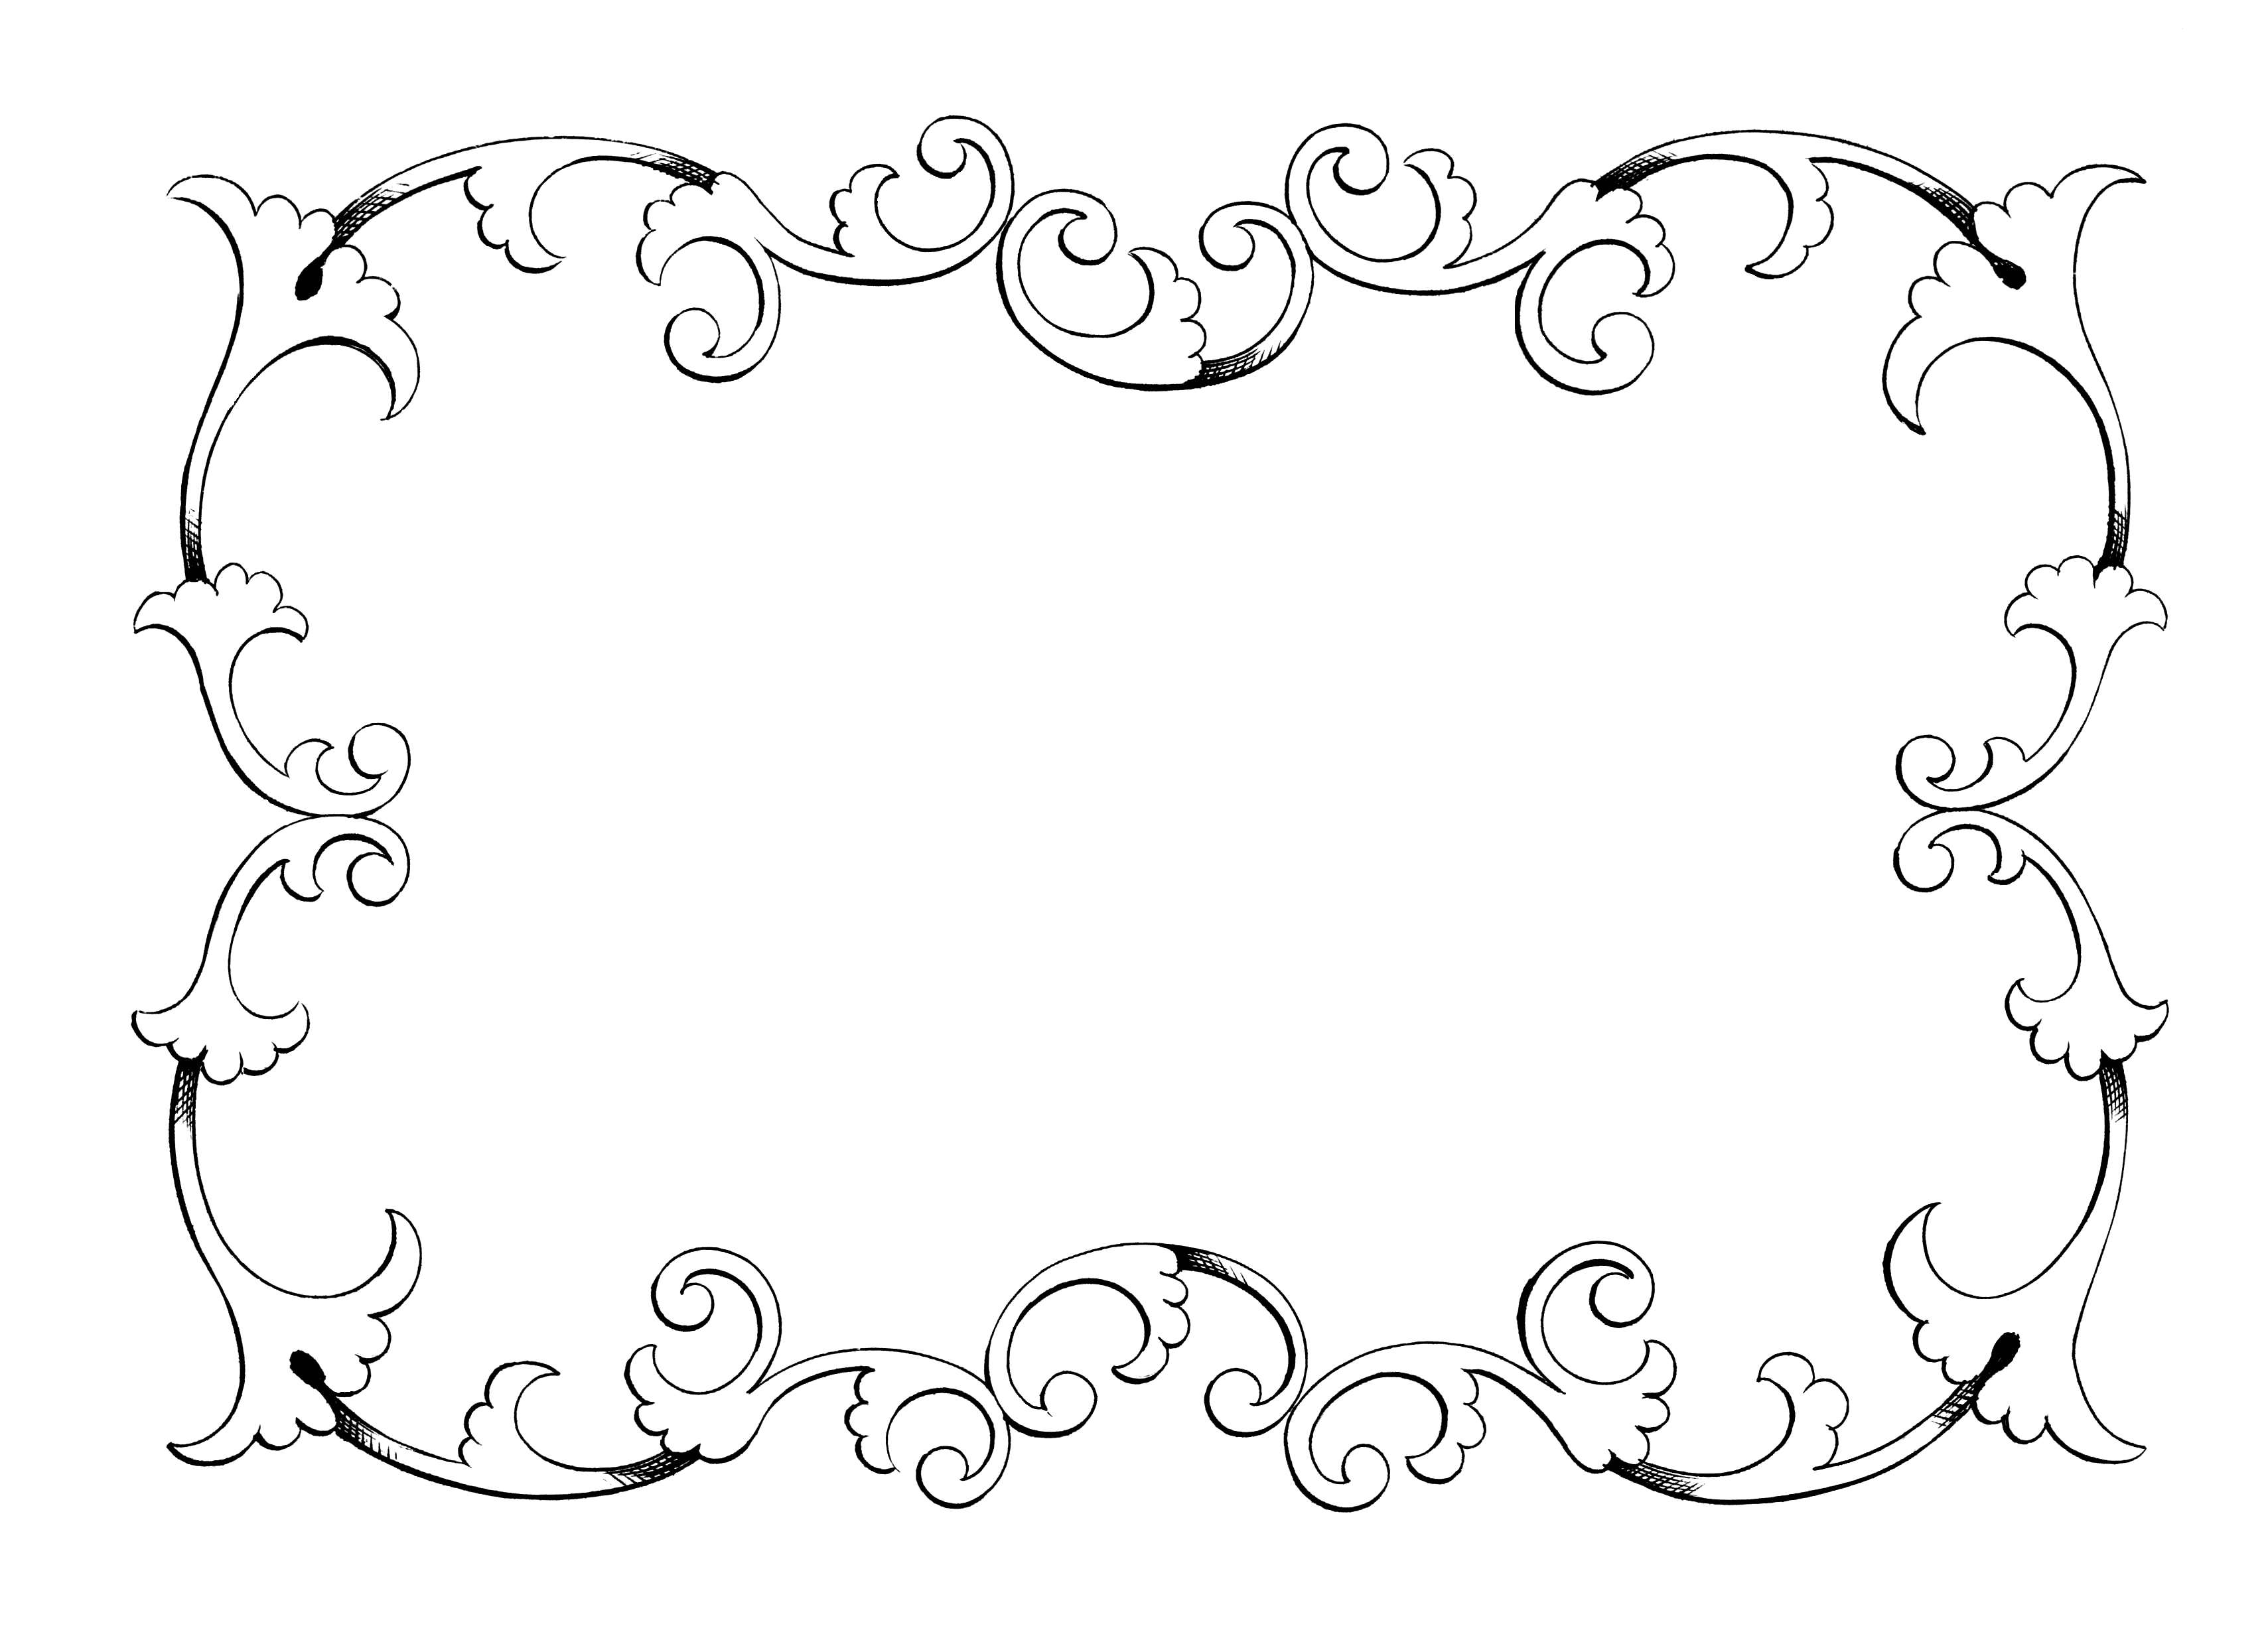 free download clip art borders-free download clip art borders-17